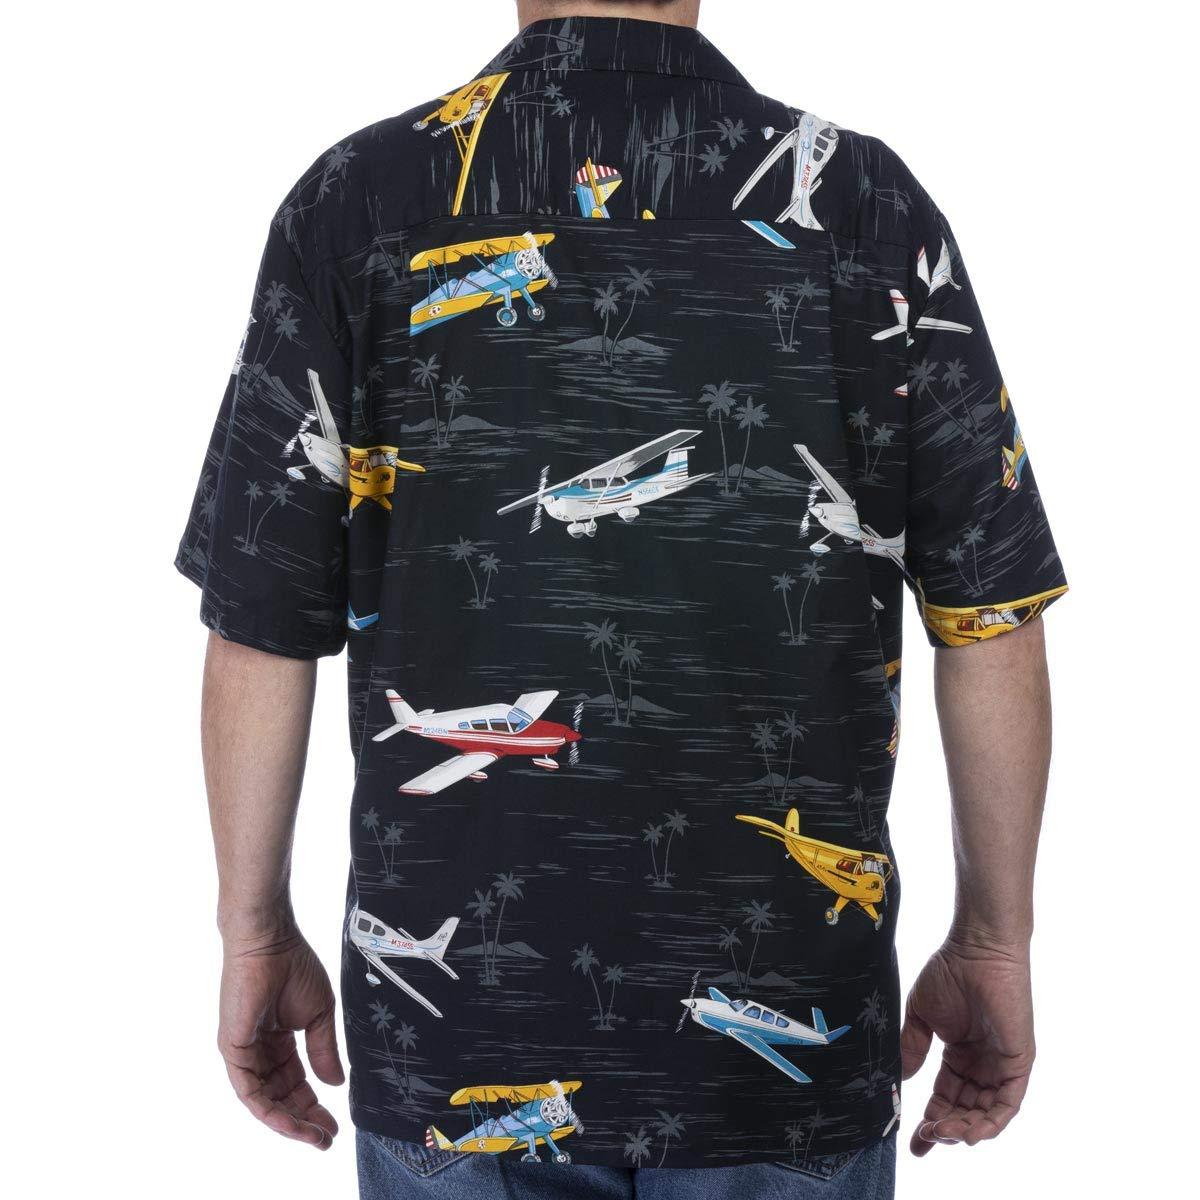 3a95cac8 Pilot Pilots Shirt Airplane Plane Aviator Flying Hawaiian Button Up Camp at  Amazon Men's Clothing store: